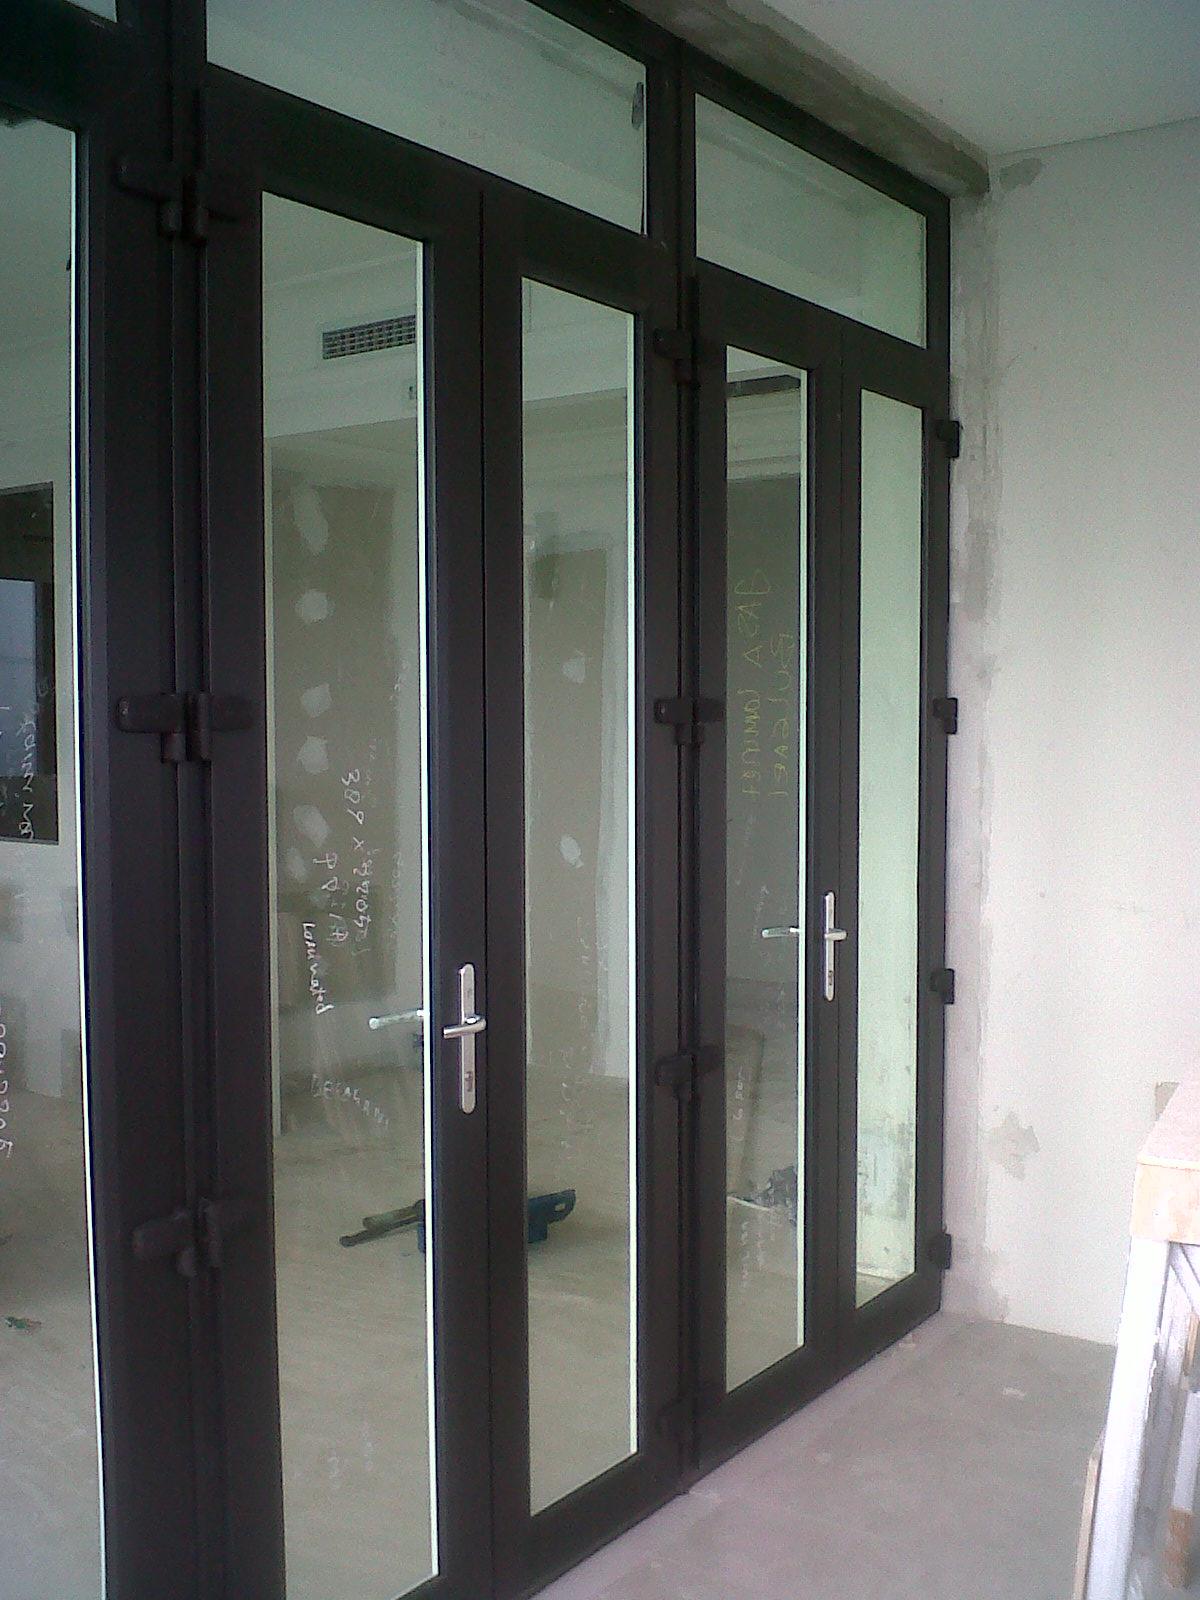 http://blog.fega.co.id/index.php/2018/11/14/perbandingan-pintu-upvc-vs-pintu-pvc/